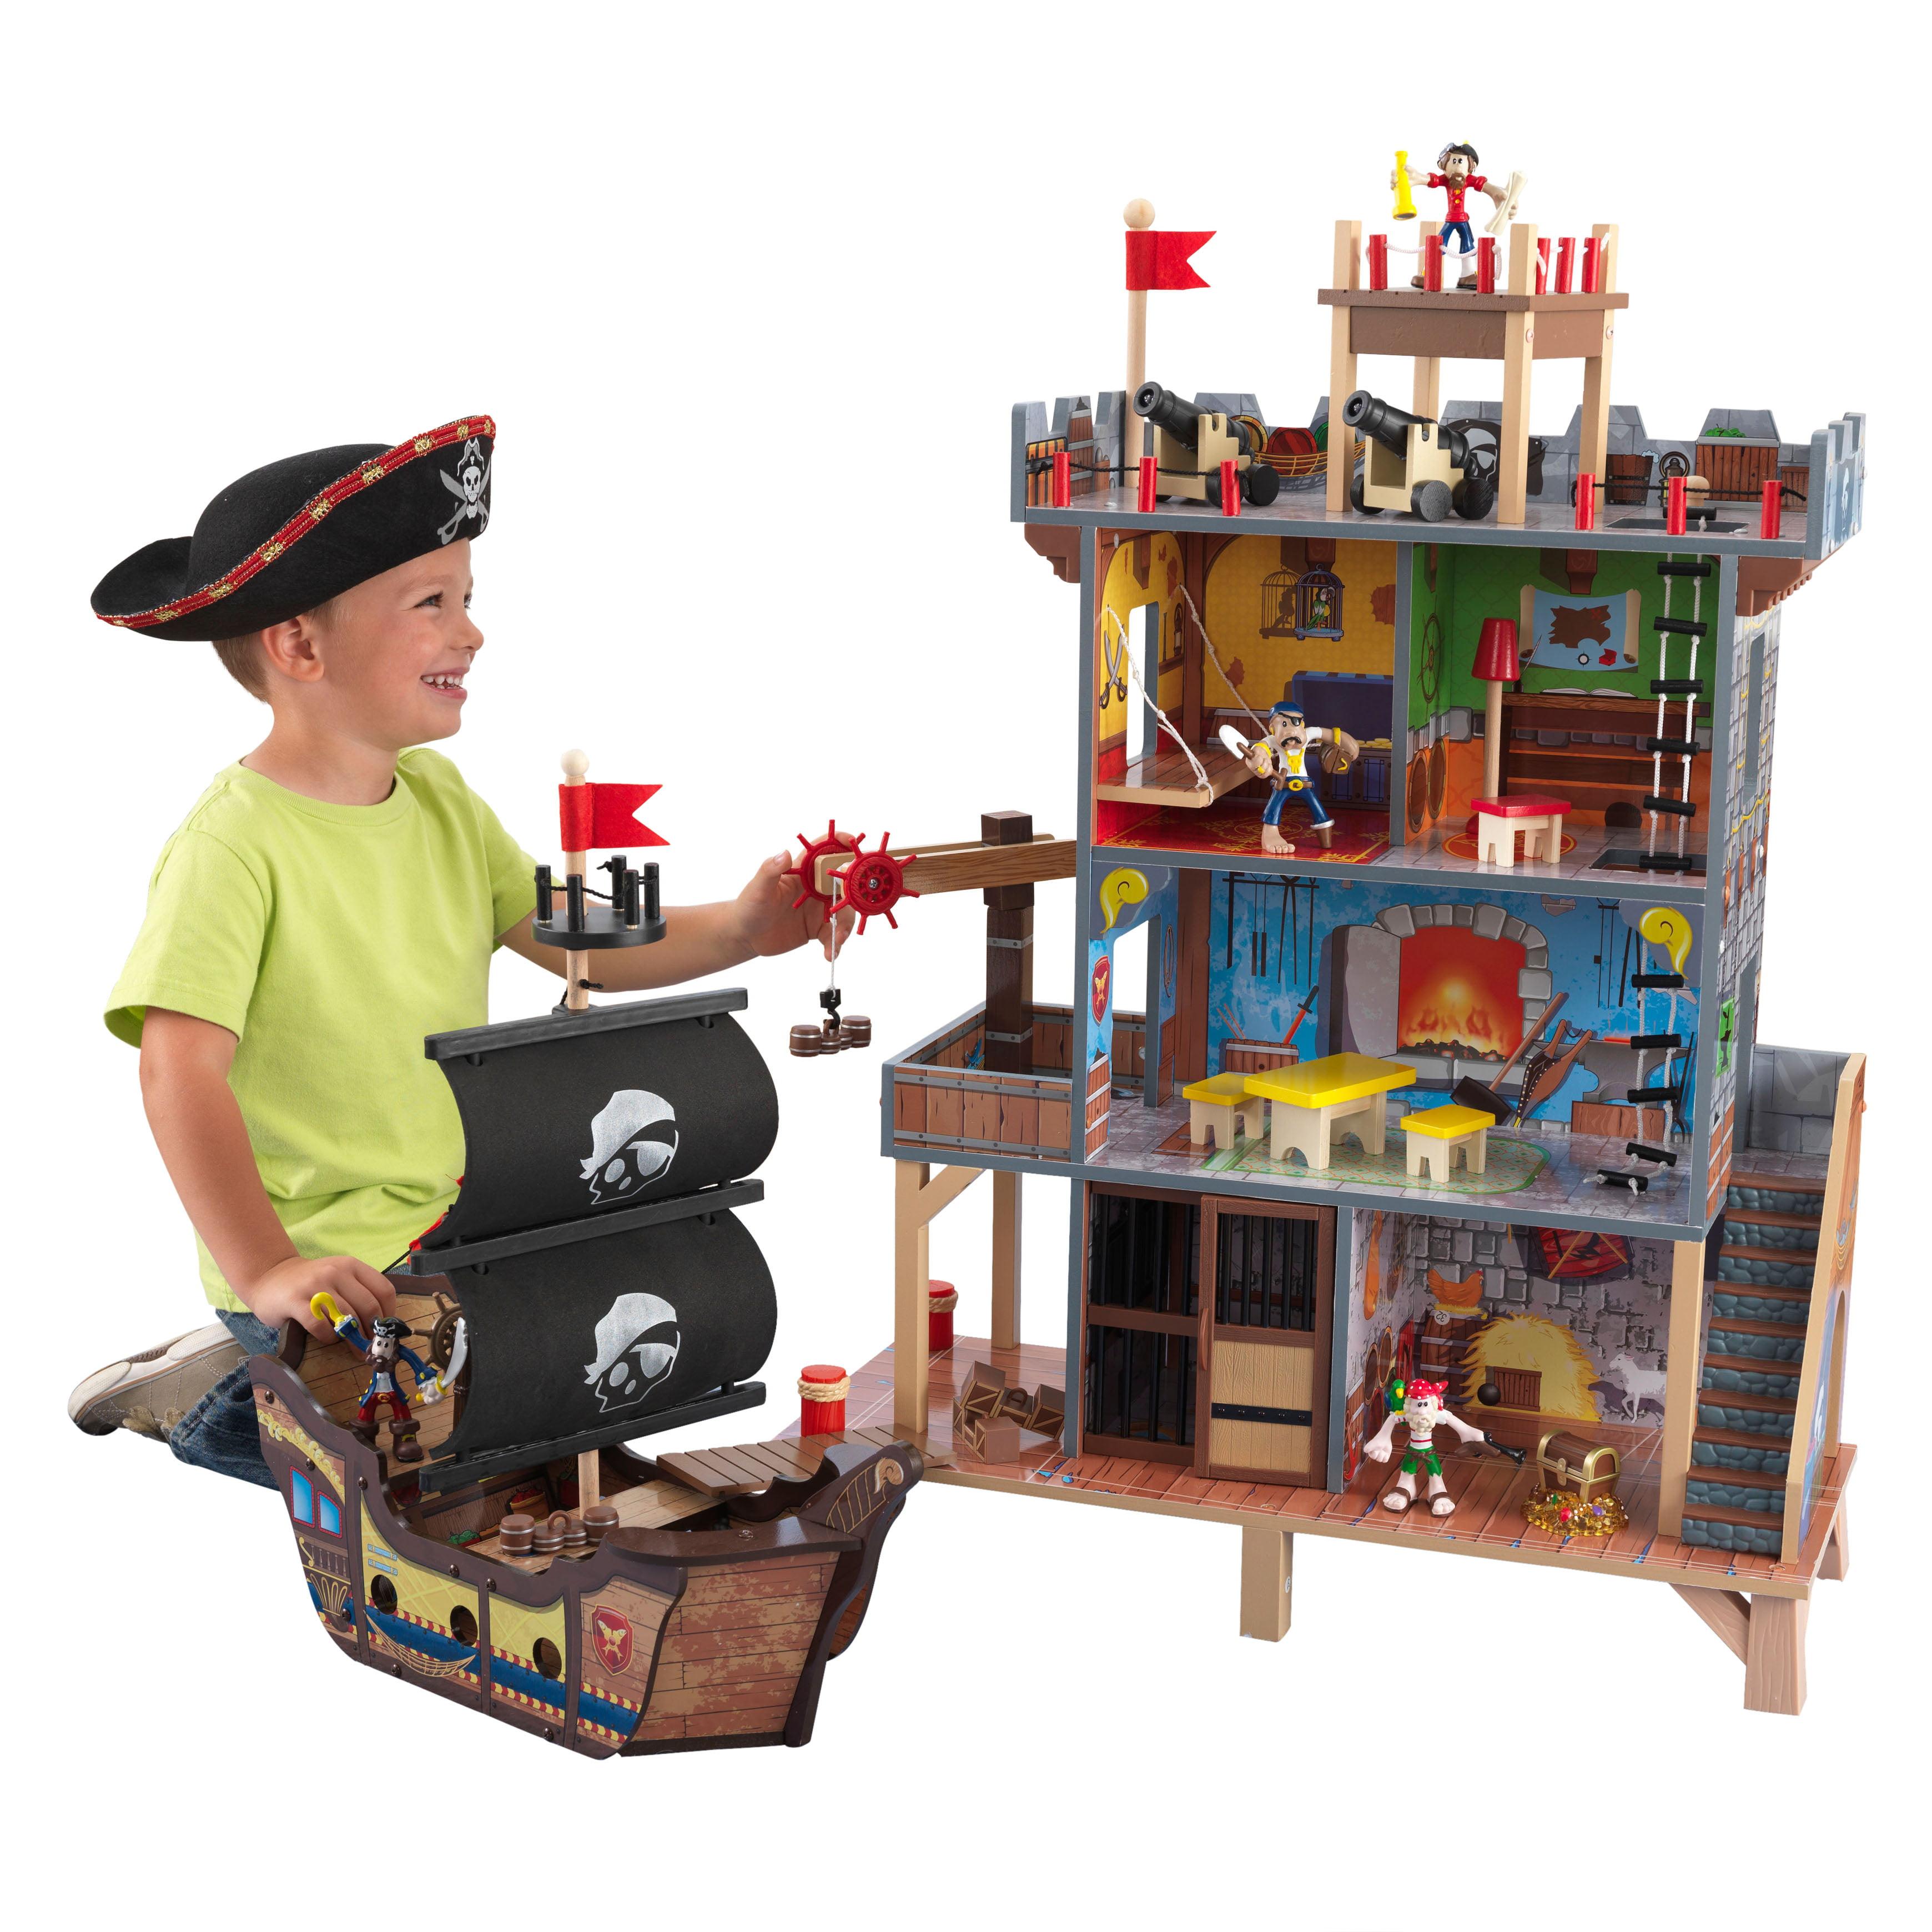 KidKraft Pirate's Cove Play Set by KidKraft